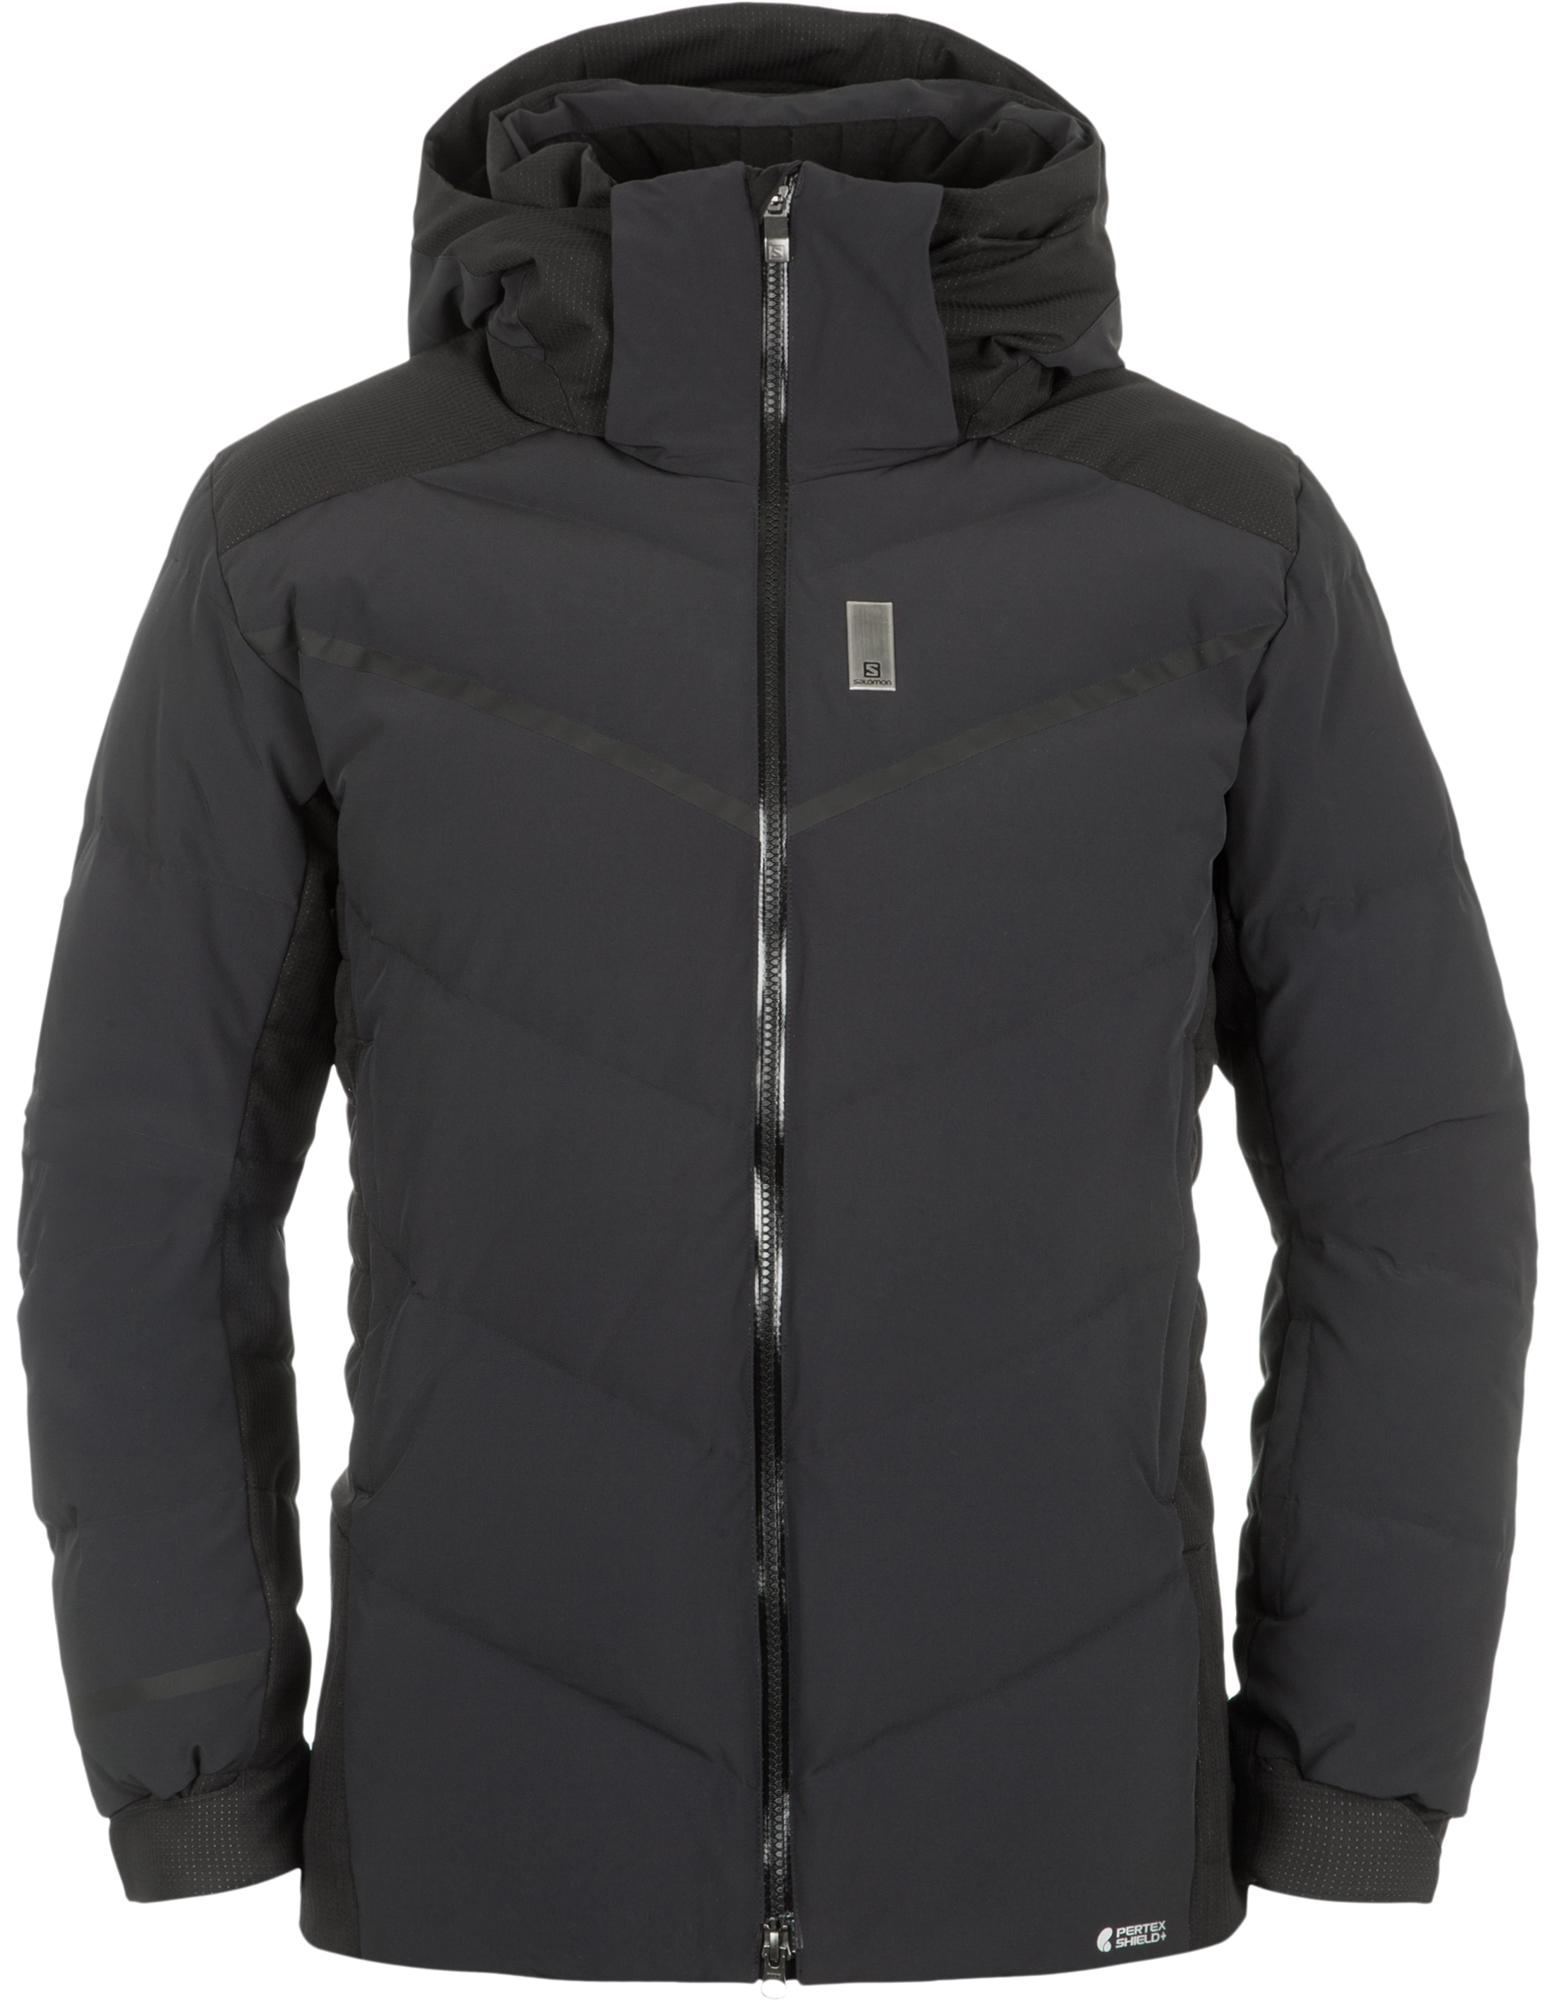 Salomon Куртка пуховая мужская Salomon Whitebreeze Down, размер 52-54